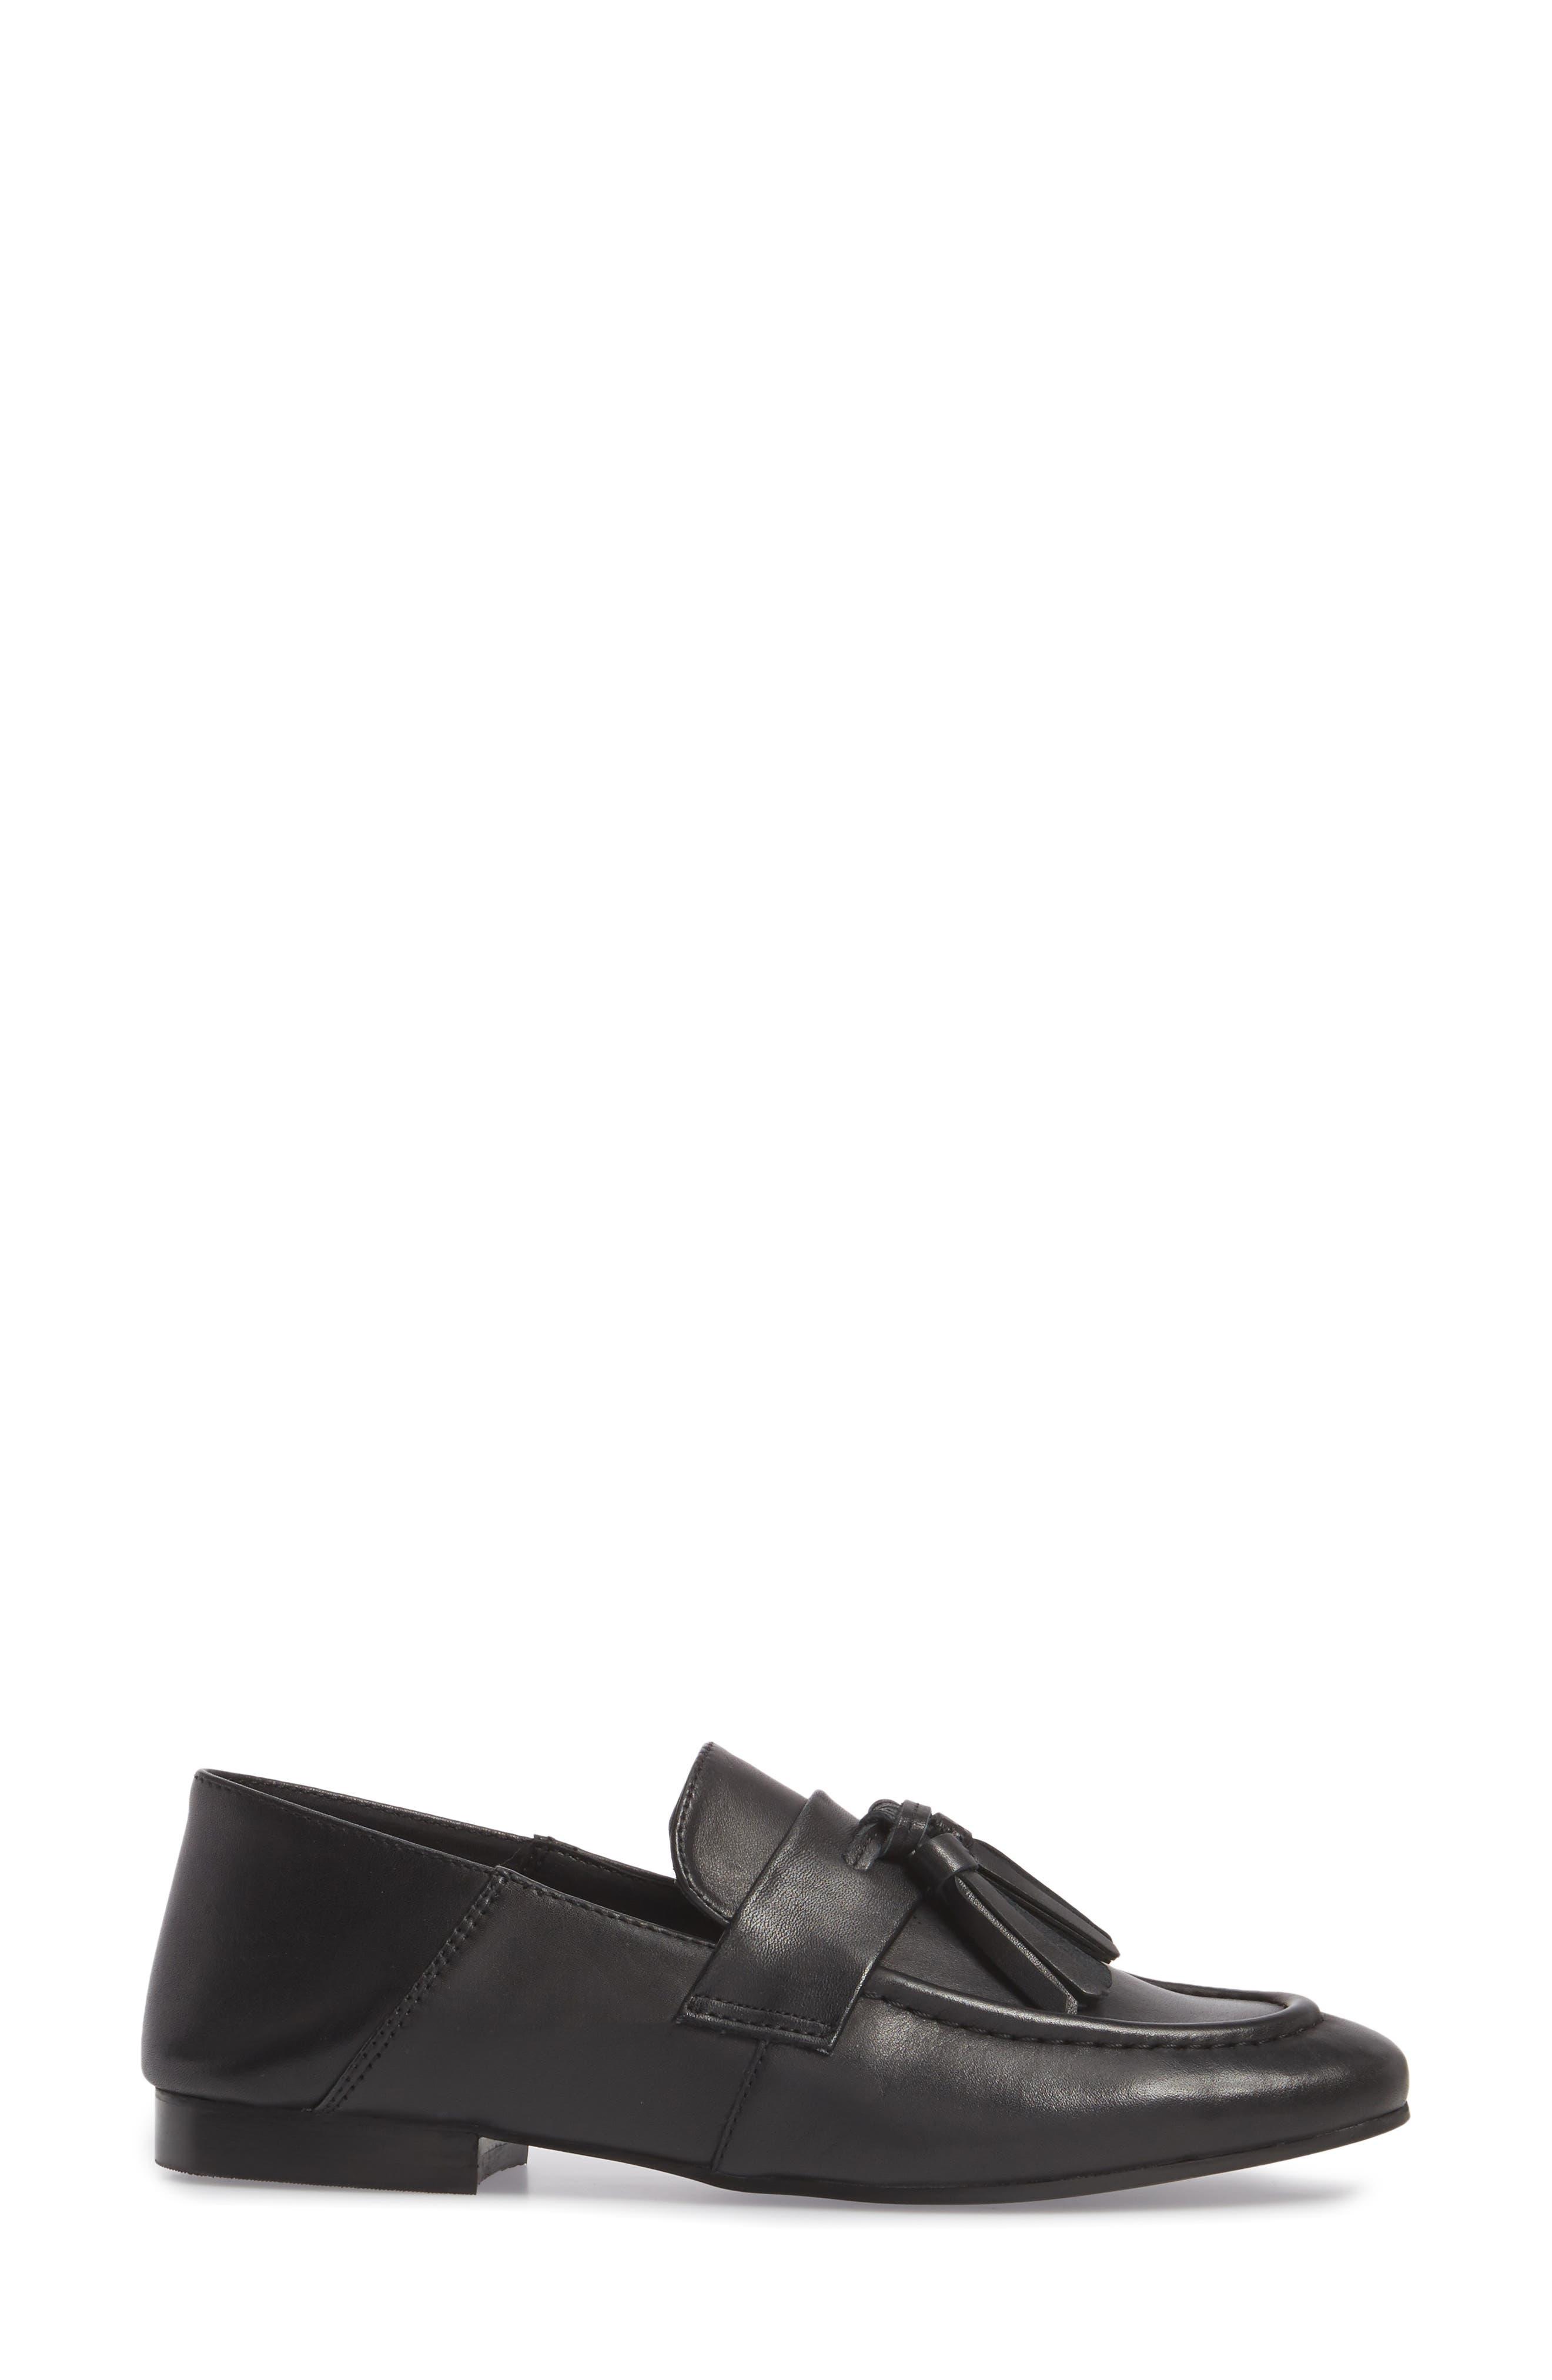 Beck Convertible Tasseled Loafer,                             Alternate thumbnail 3, color,                             001